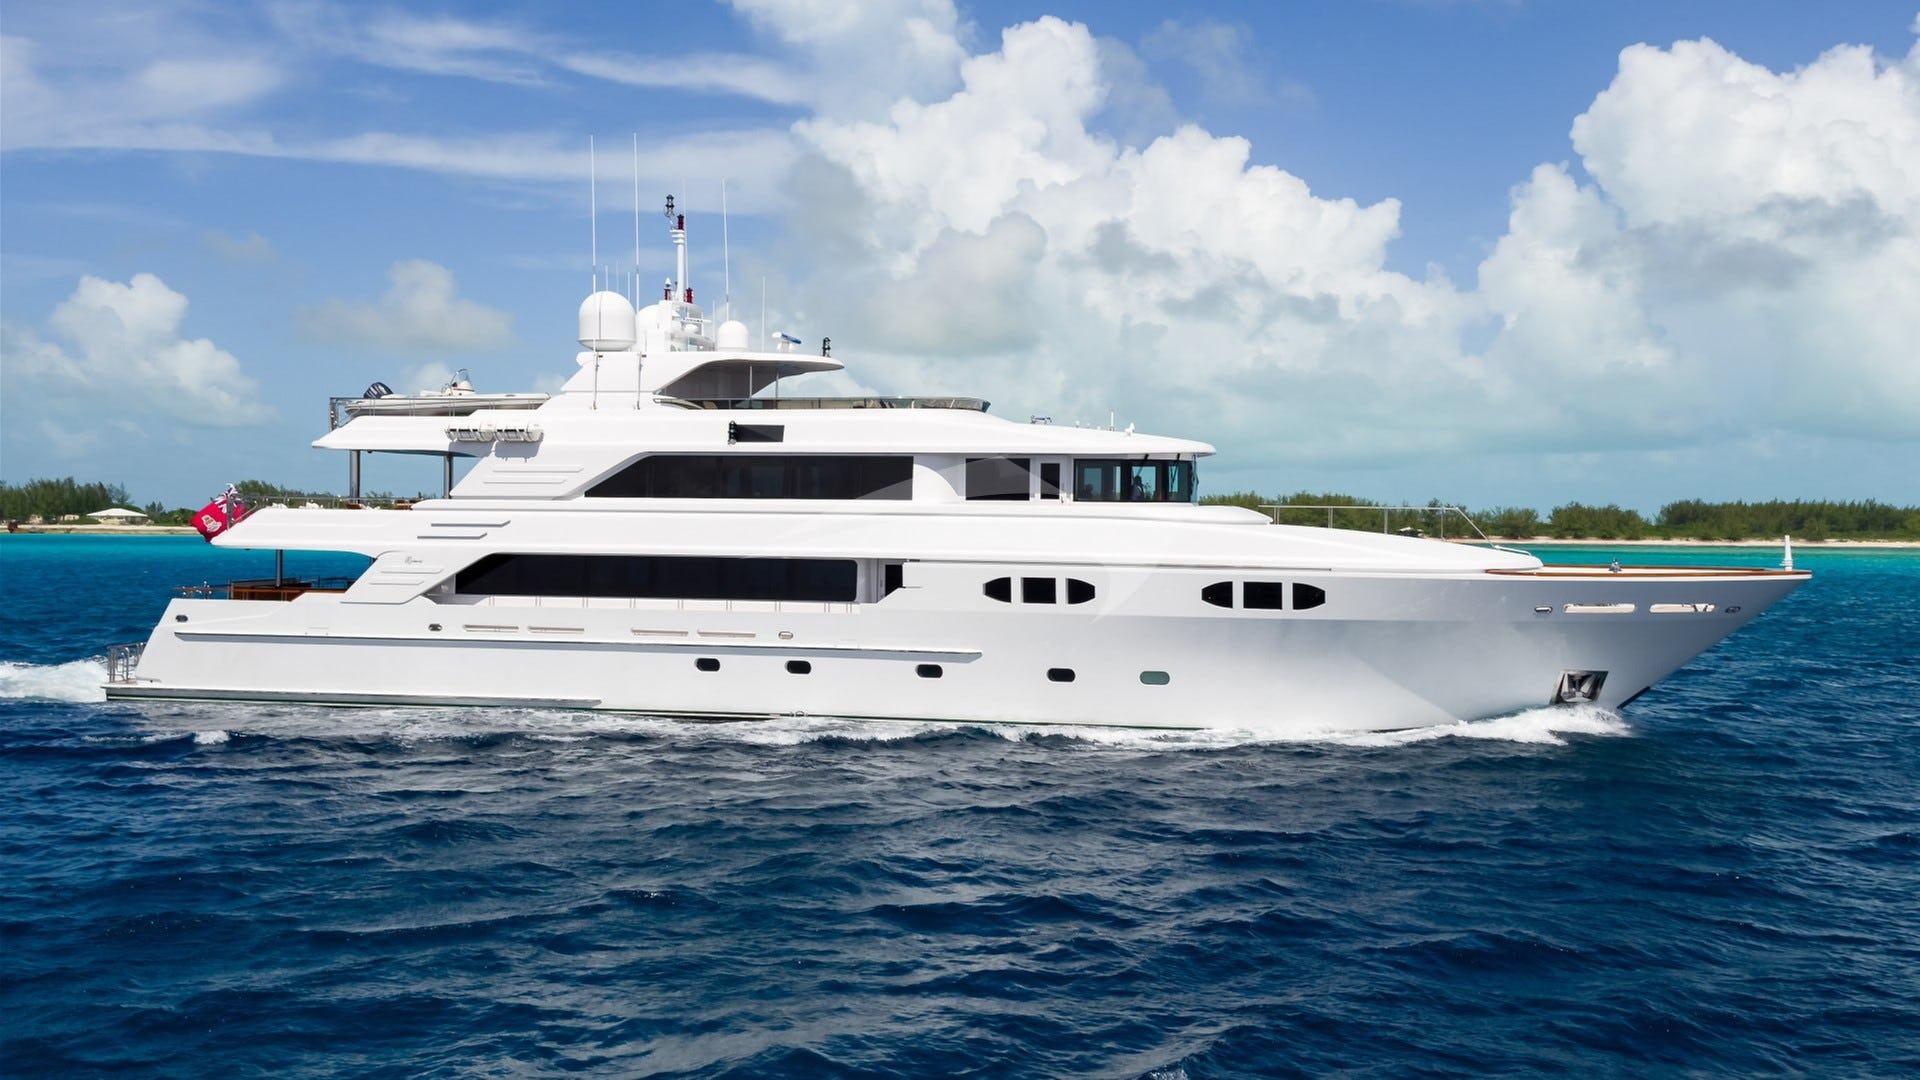 Yacht FAR FROM IT Charter Yacht